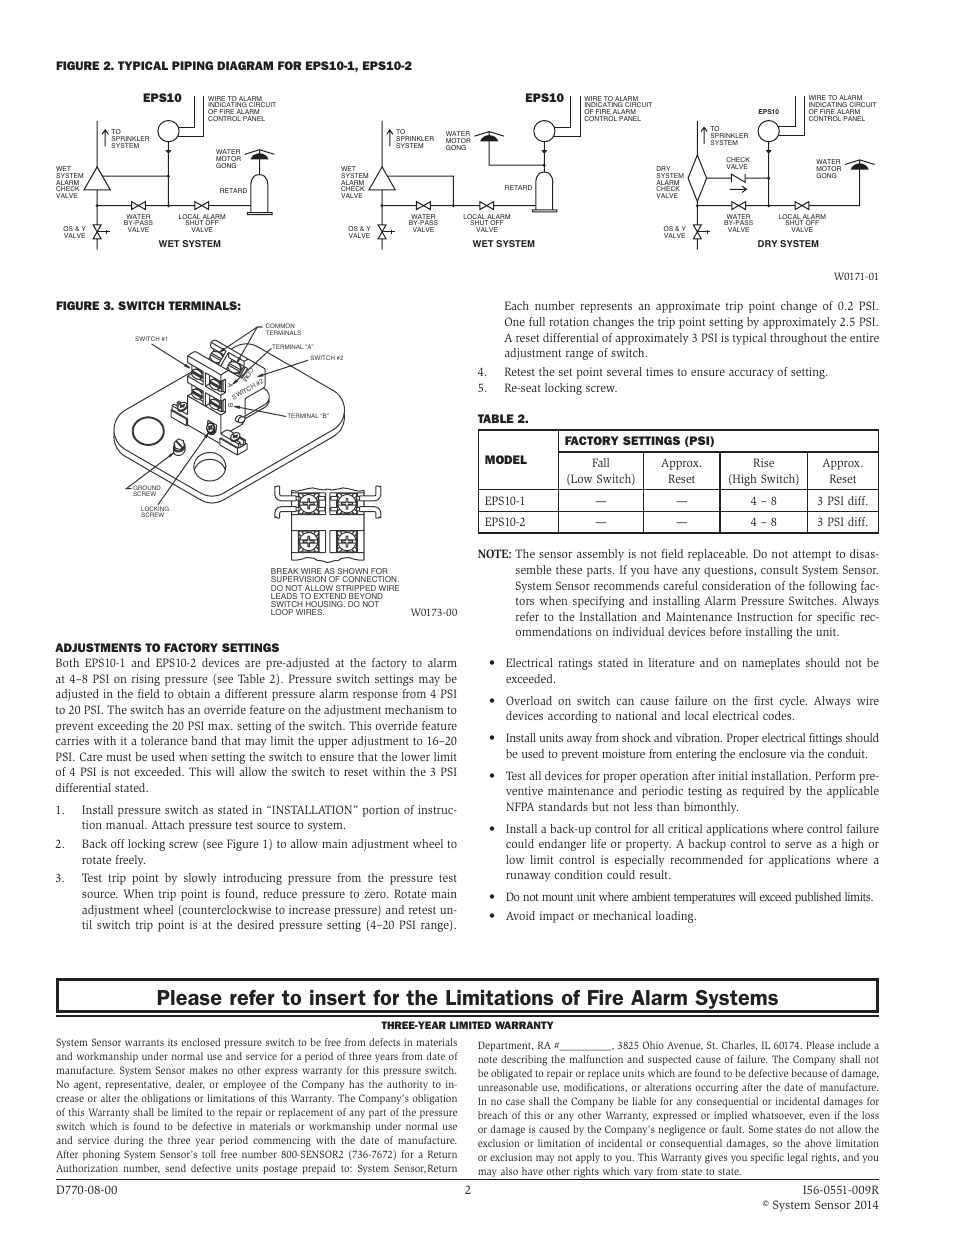 System Sensor D4100 Wiring Diagram